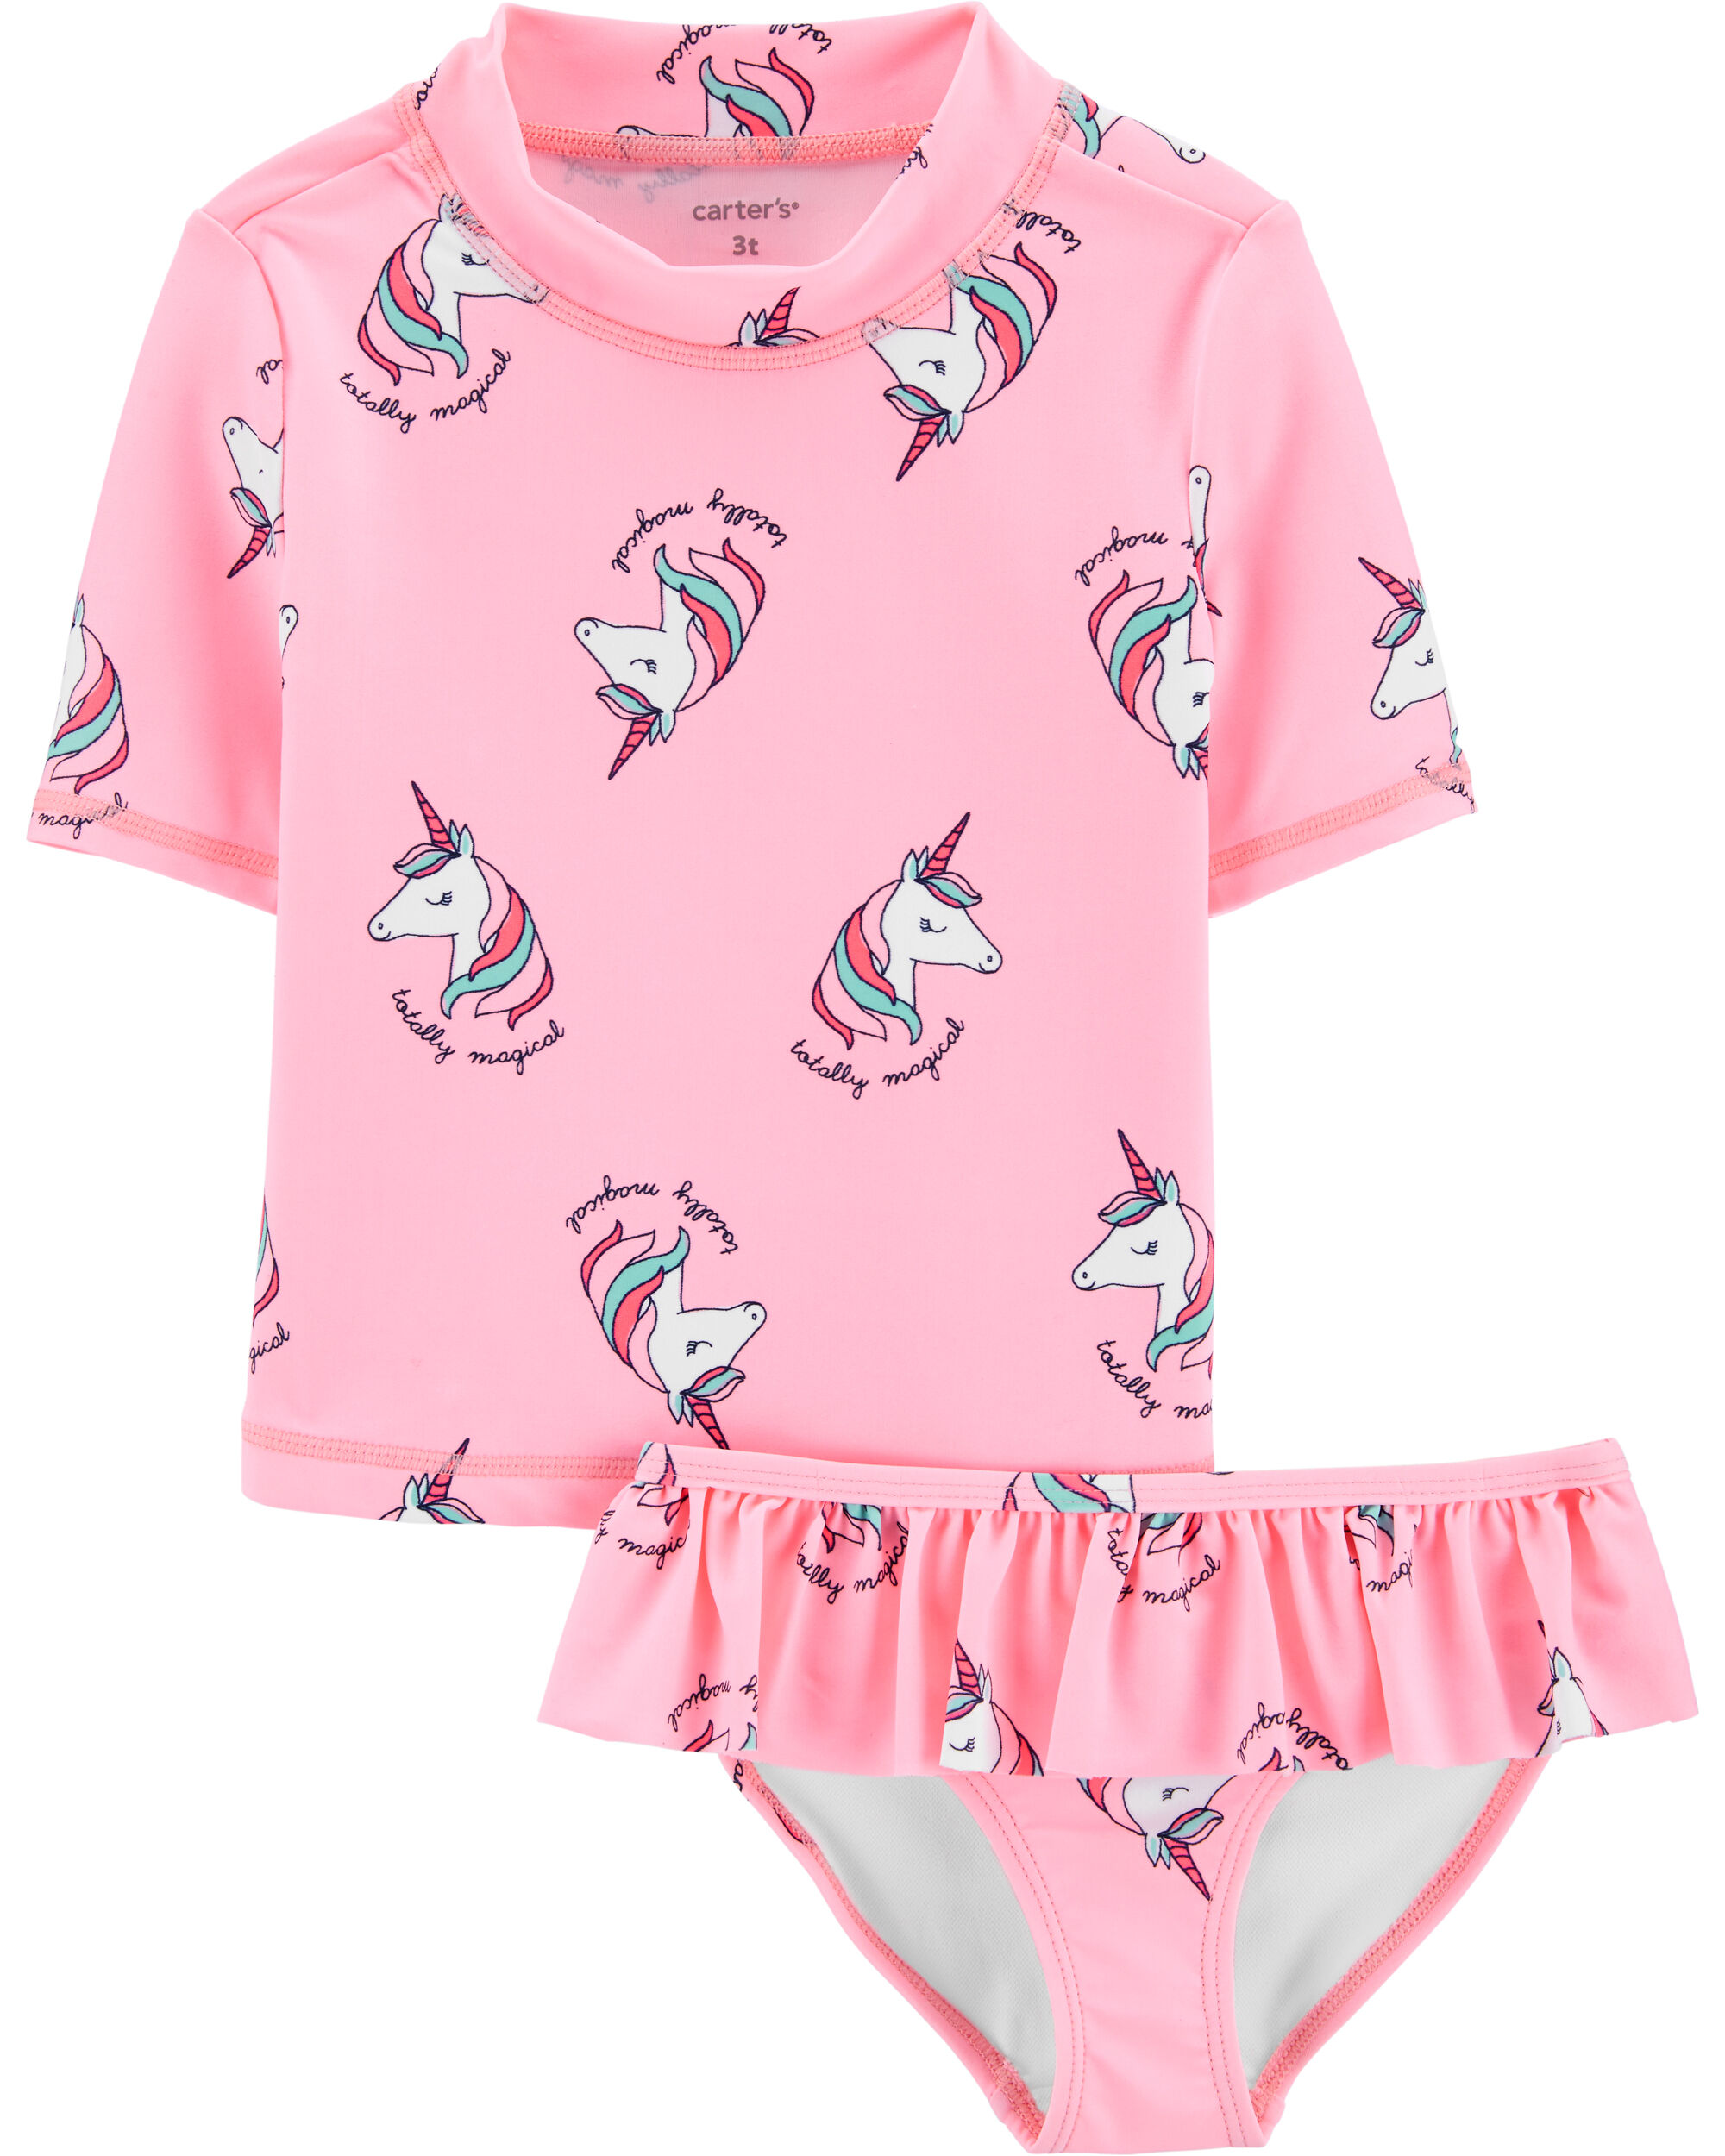 NWT Carter/'s Size 3T or 4T Unicorn Rash Guard Swimsuit Bathing Suit 2 piece